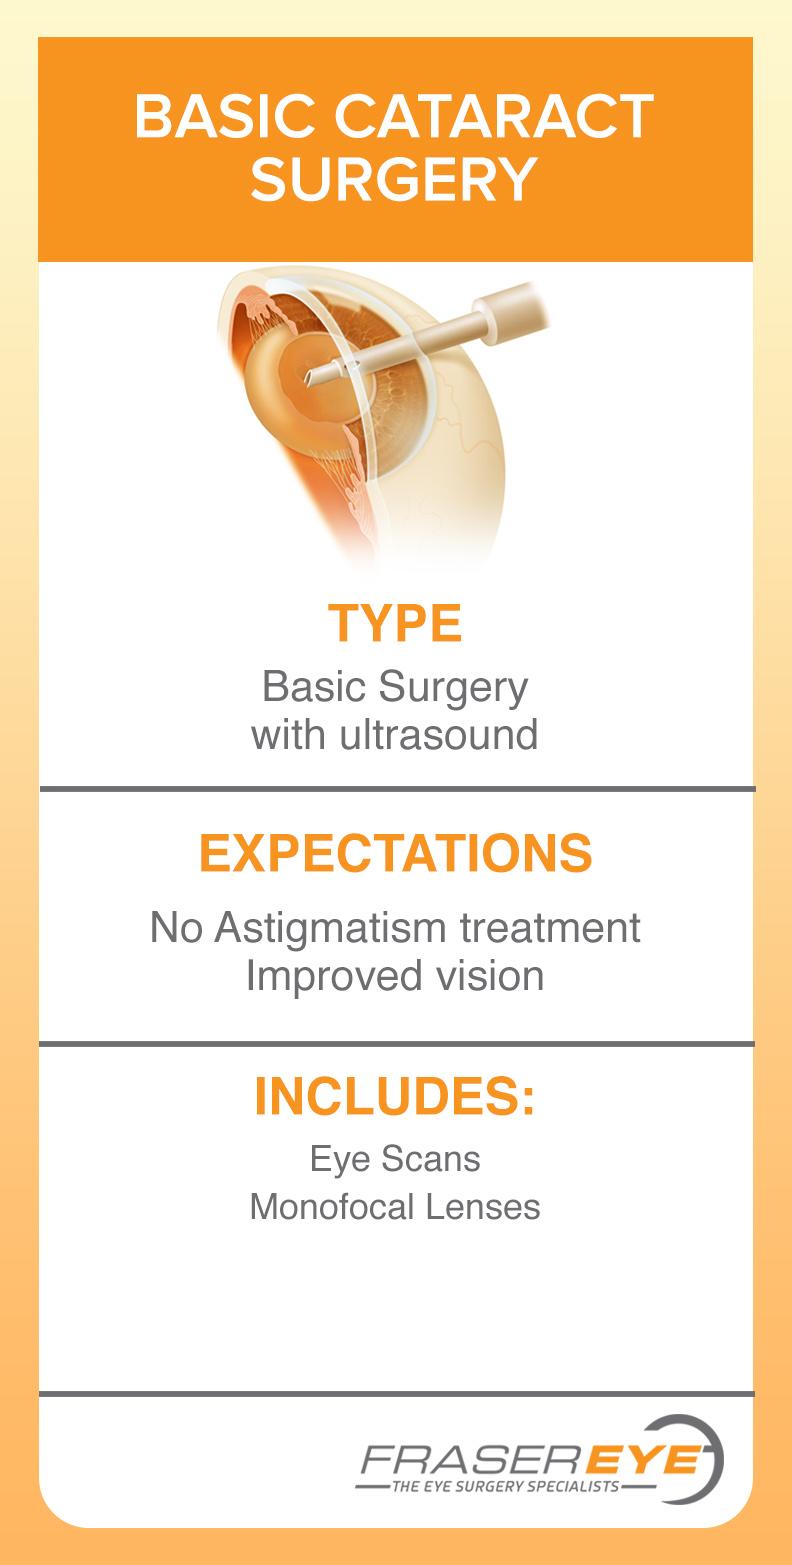 Basic Cataract surgery